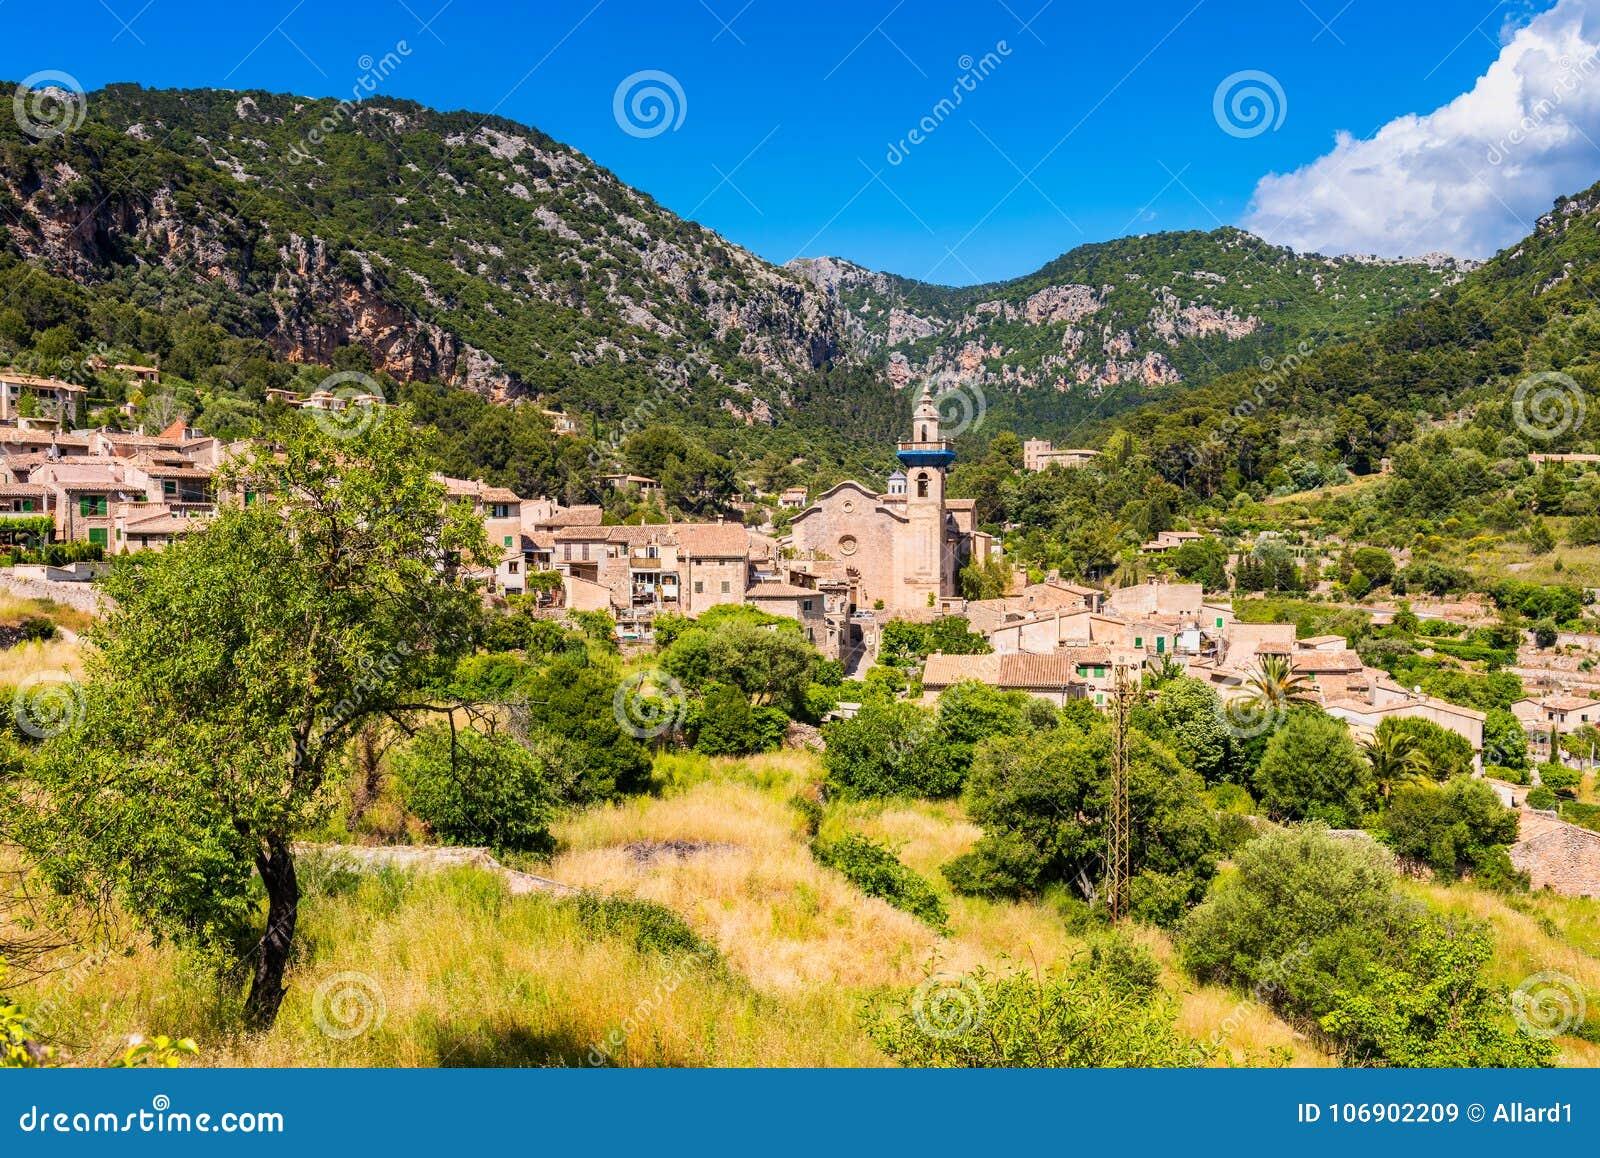 Widok na wiosce Valldemossa Mallorca